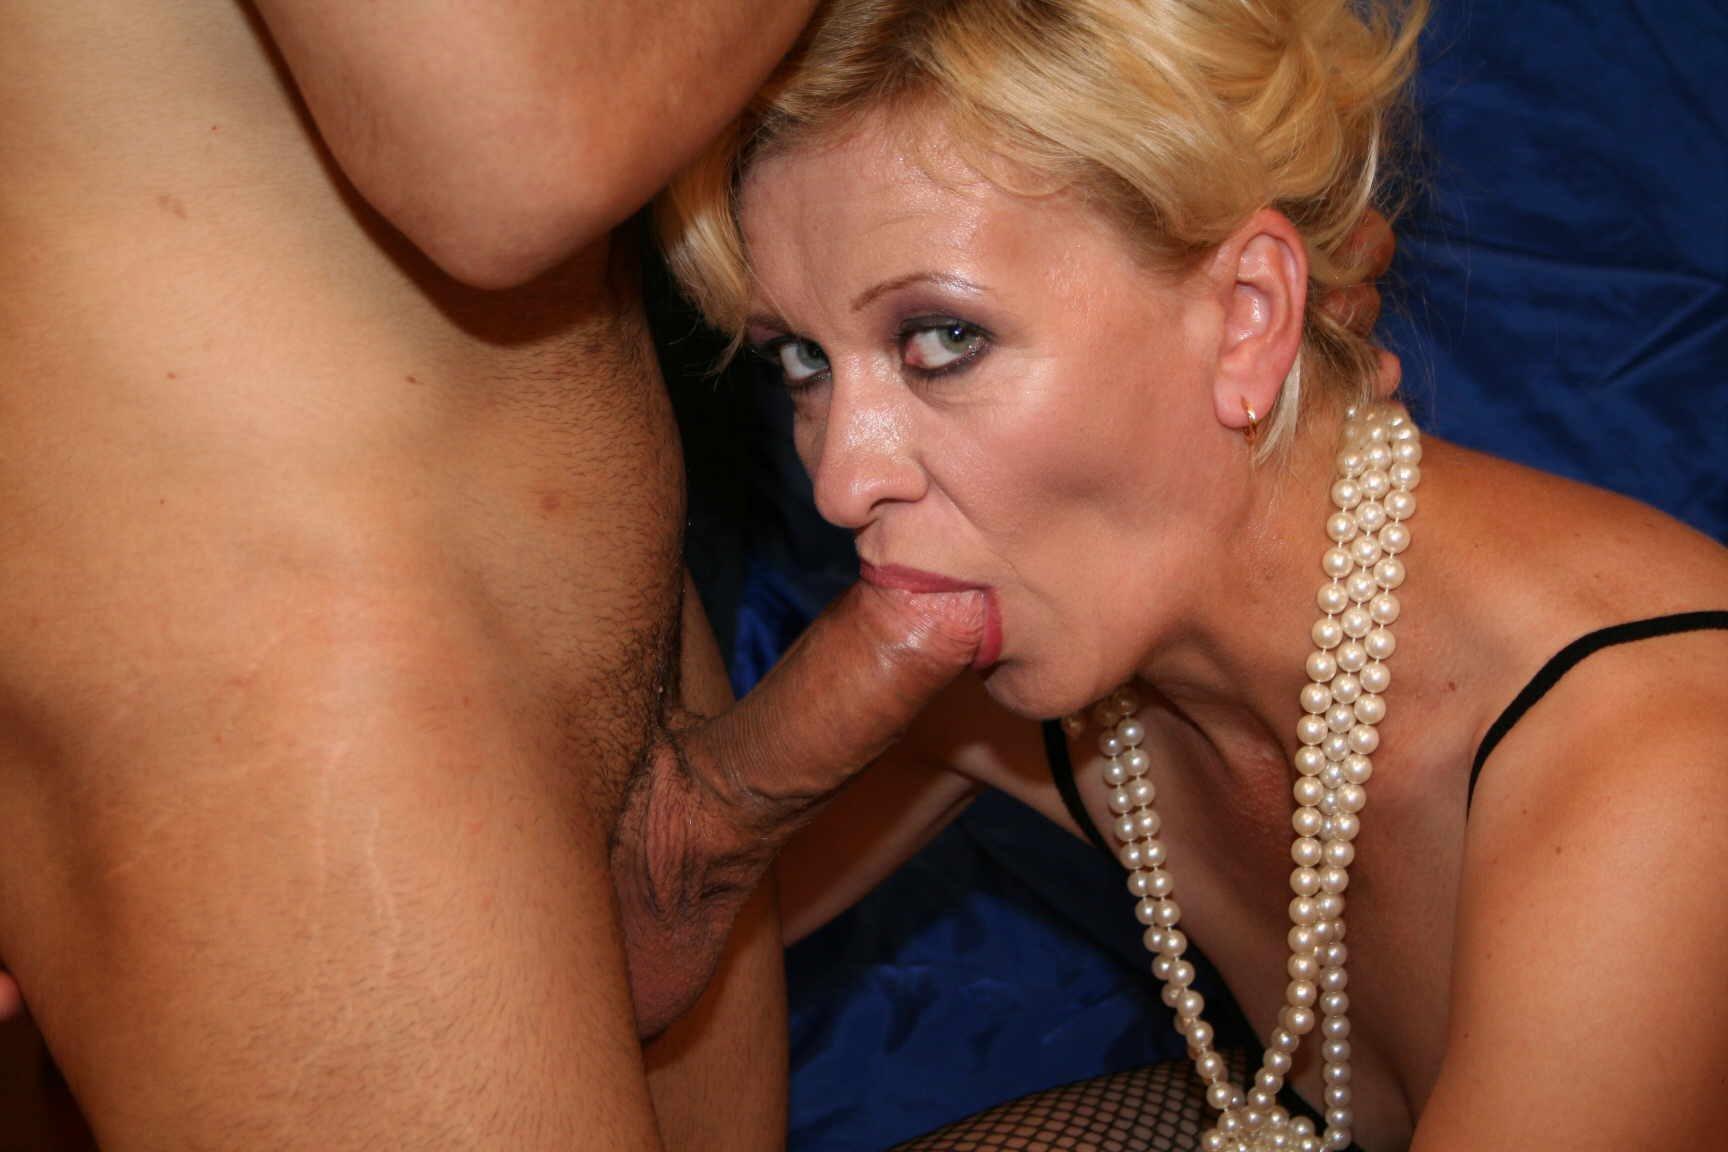 Mature Sex Beautiful Older Women Sucking Dick